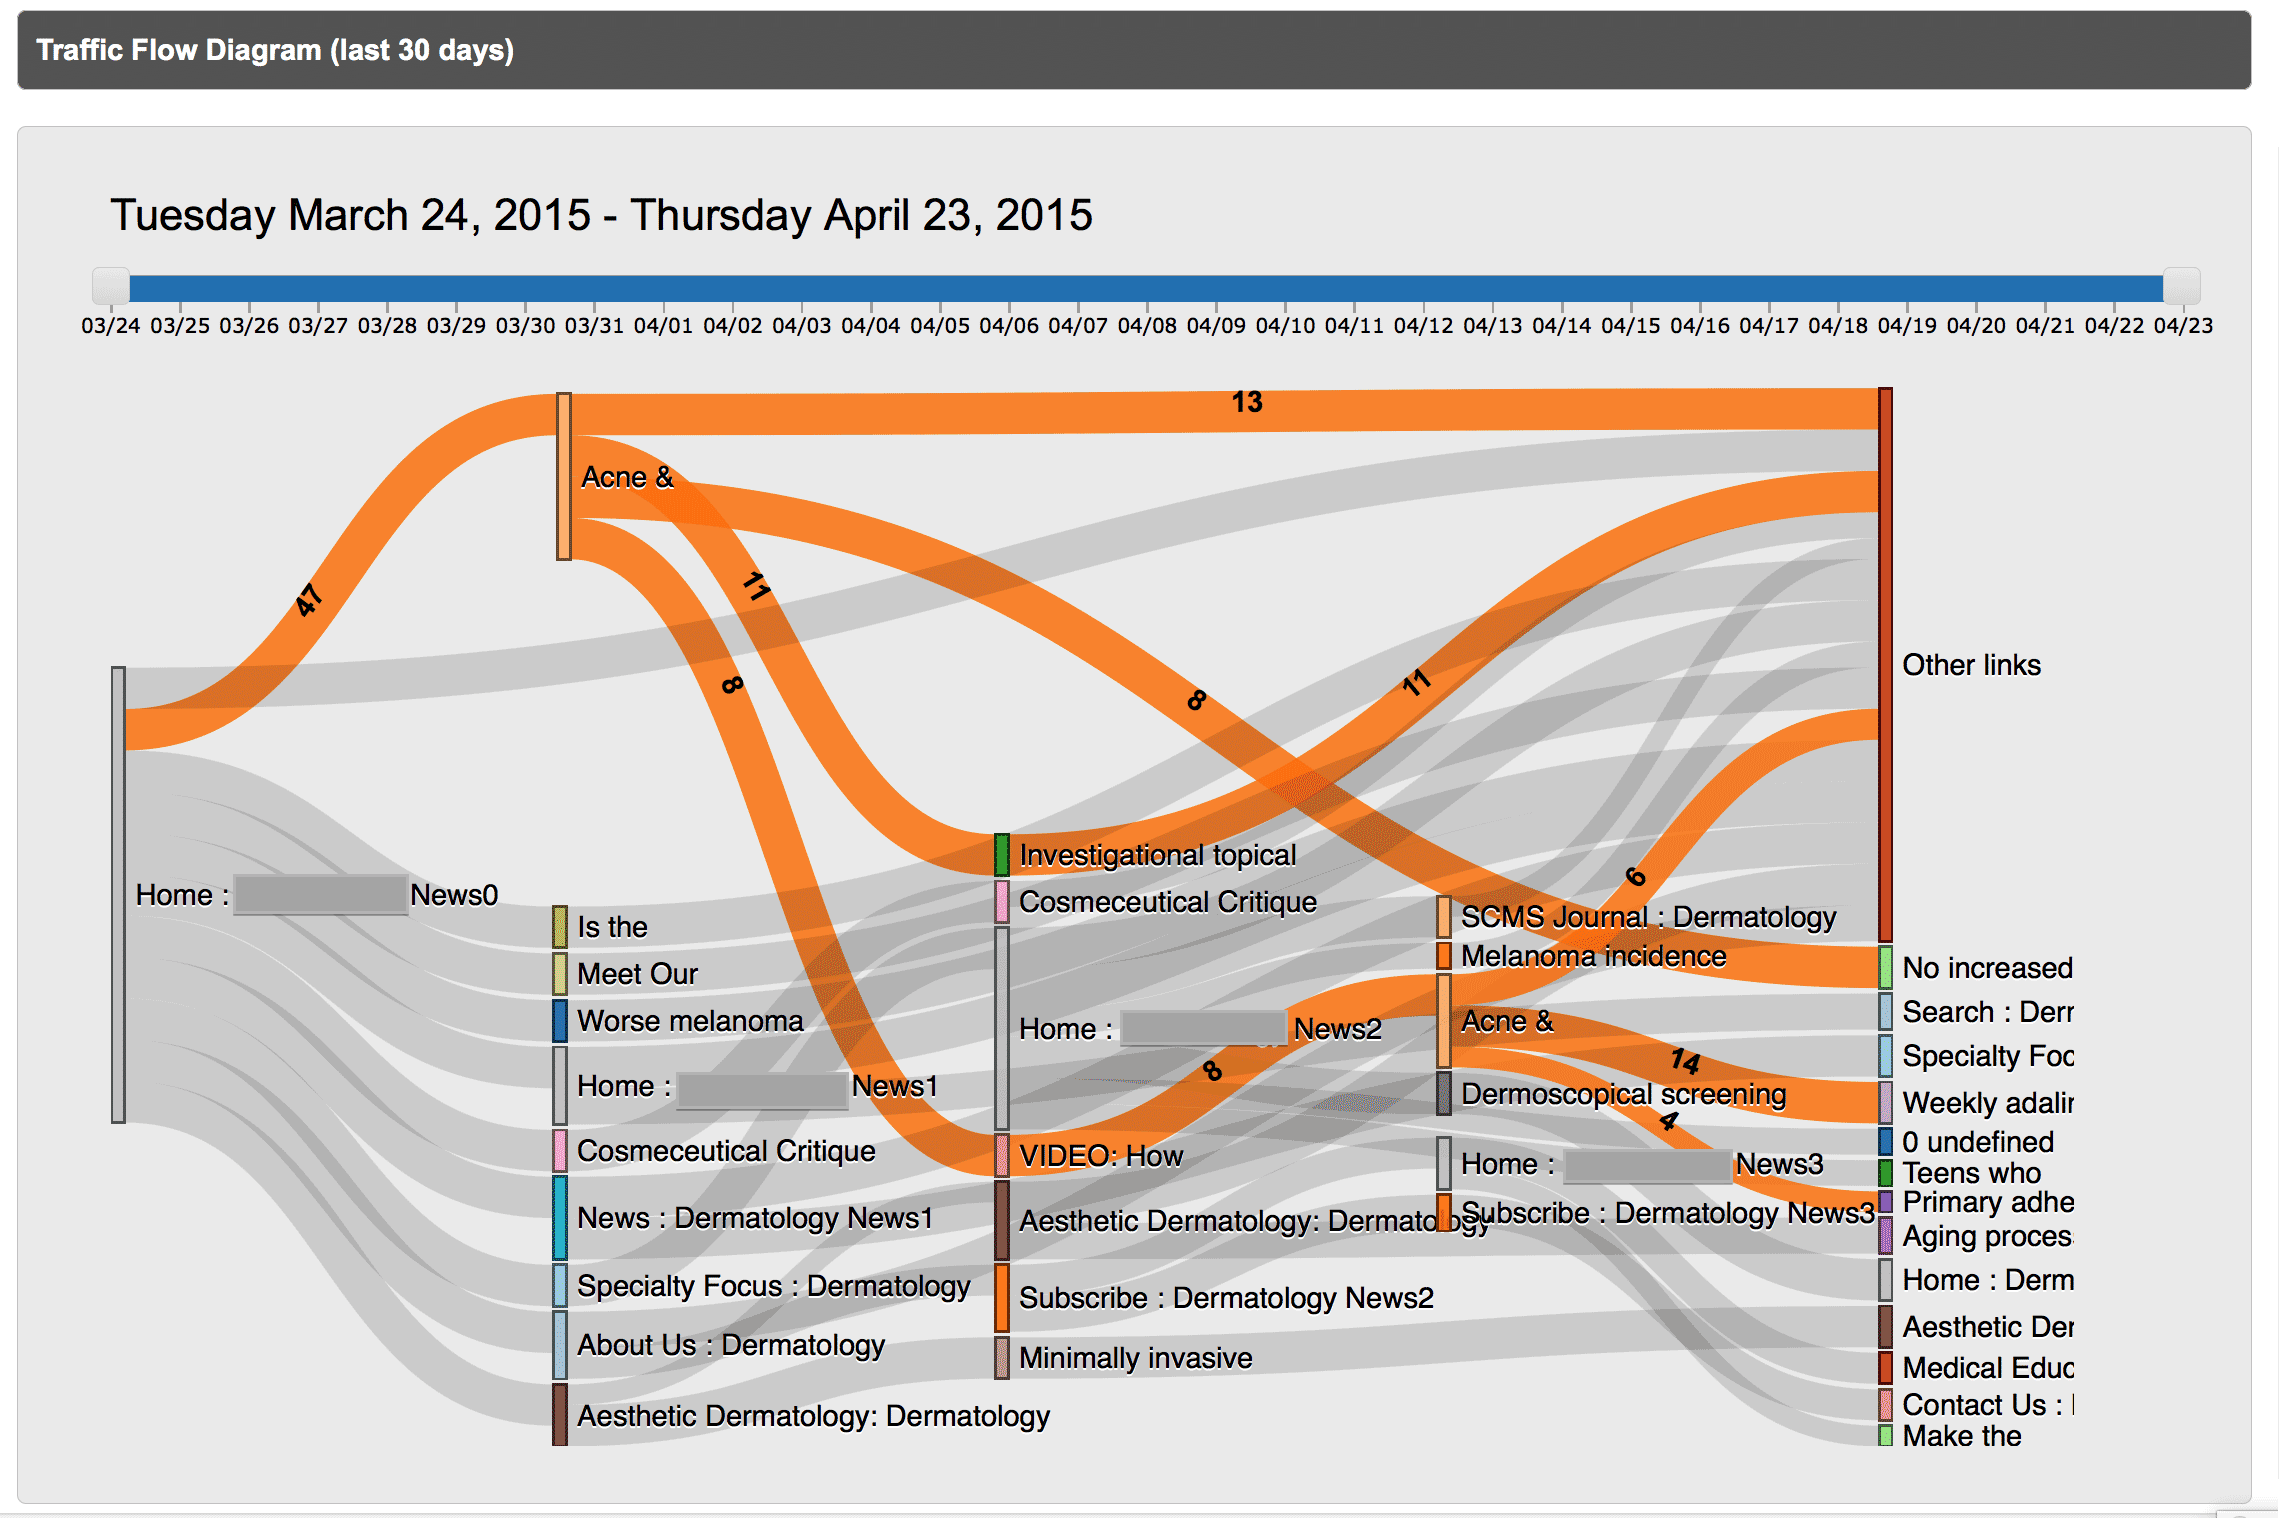 Visual Sankey traffic flow diagrams